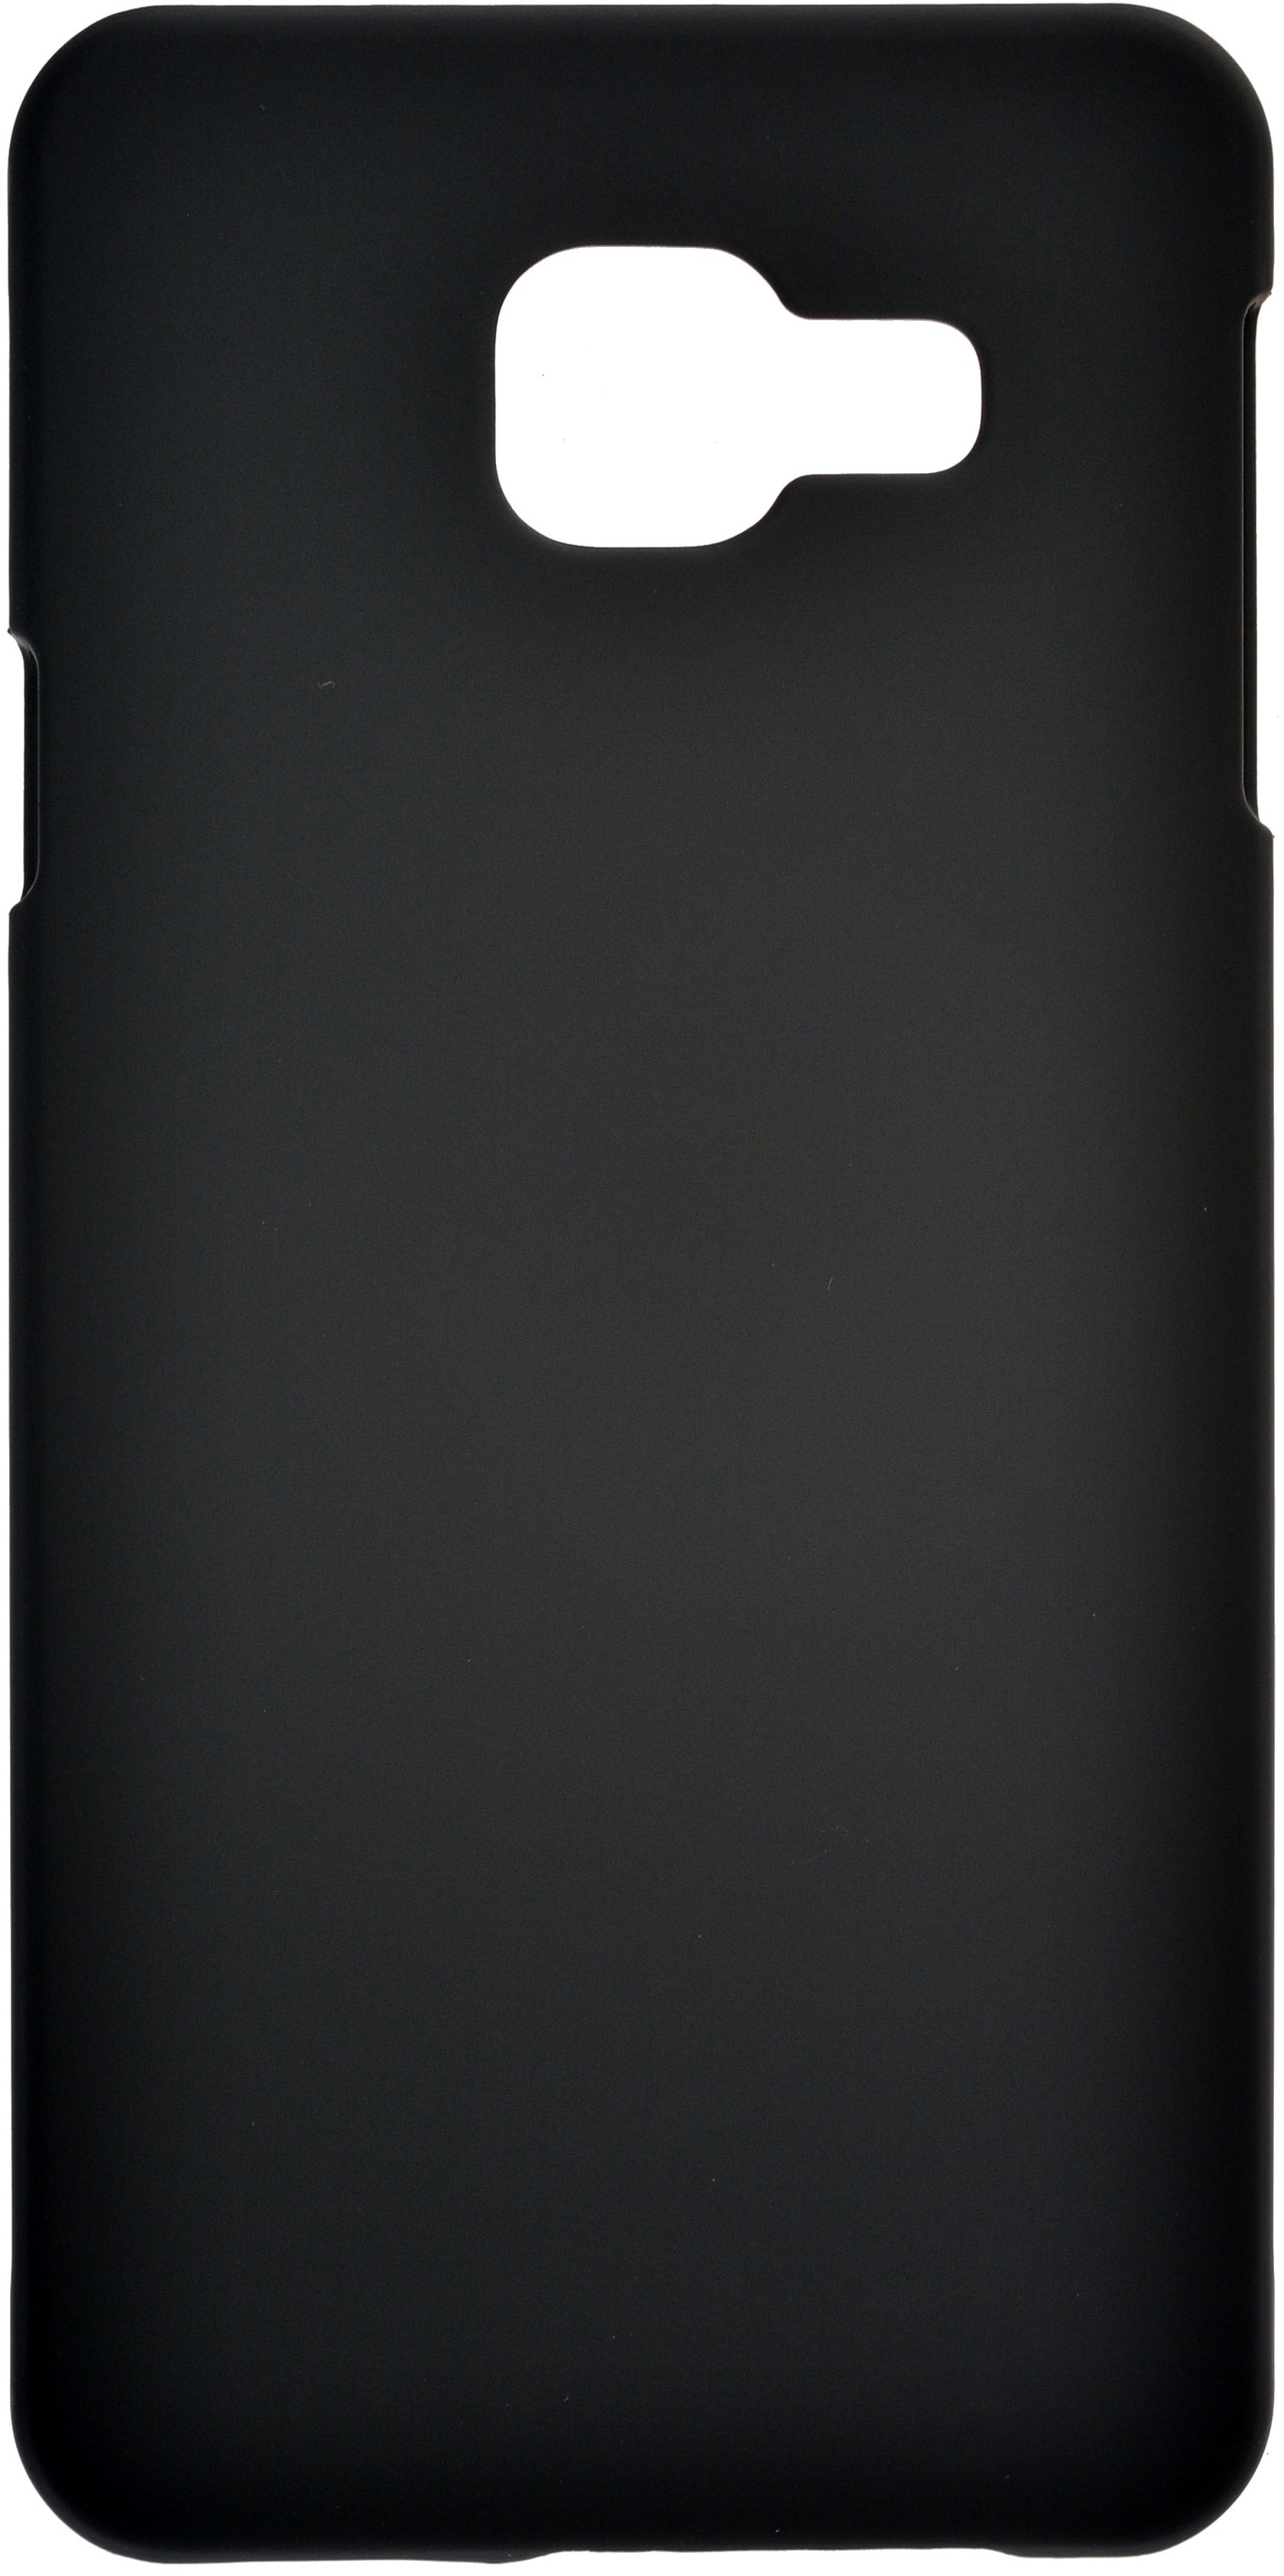 Чехол skinBOX 4People для Samsung Galaxy A3 (2016) SM-A310F, черный